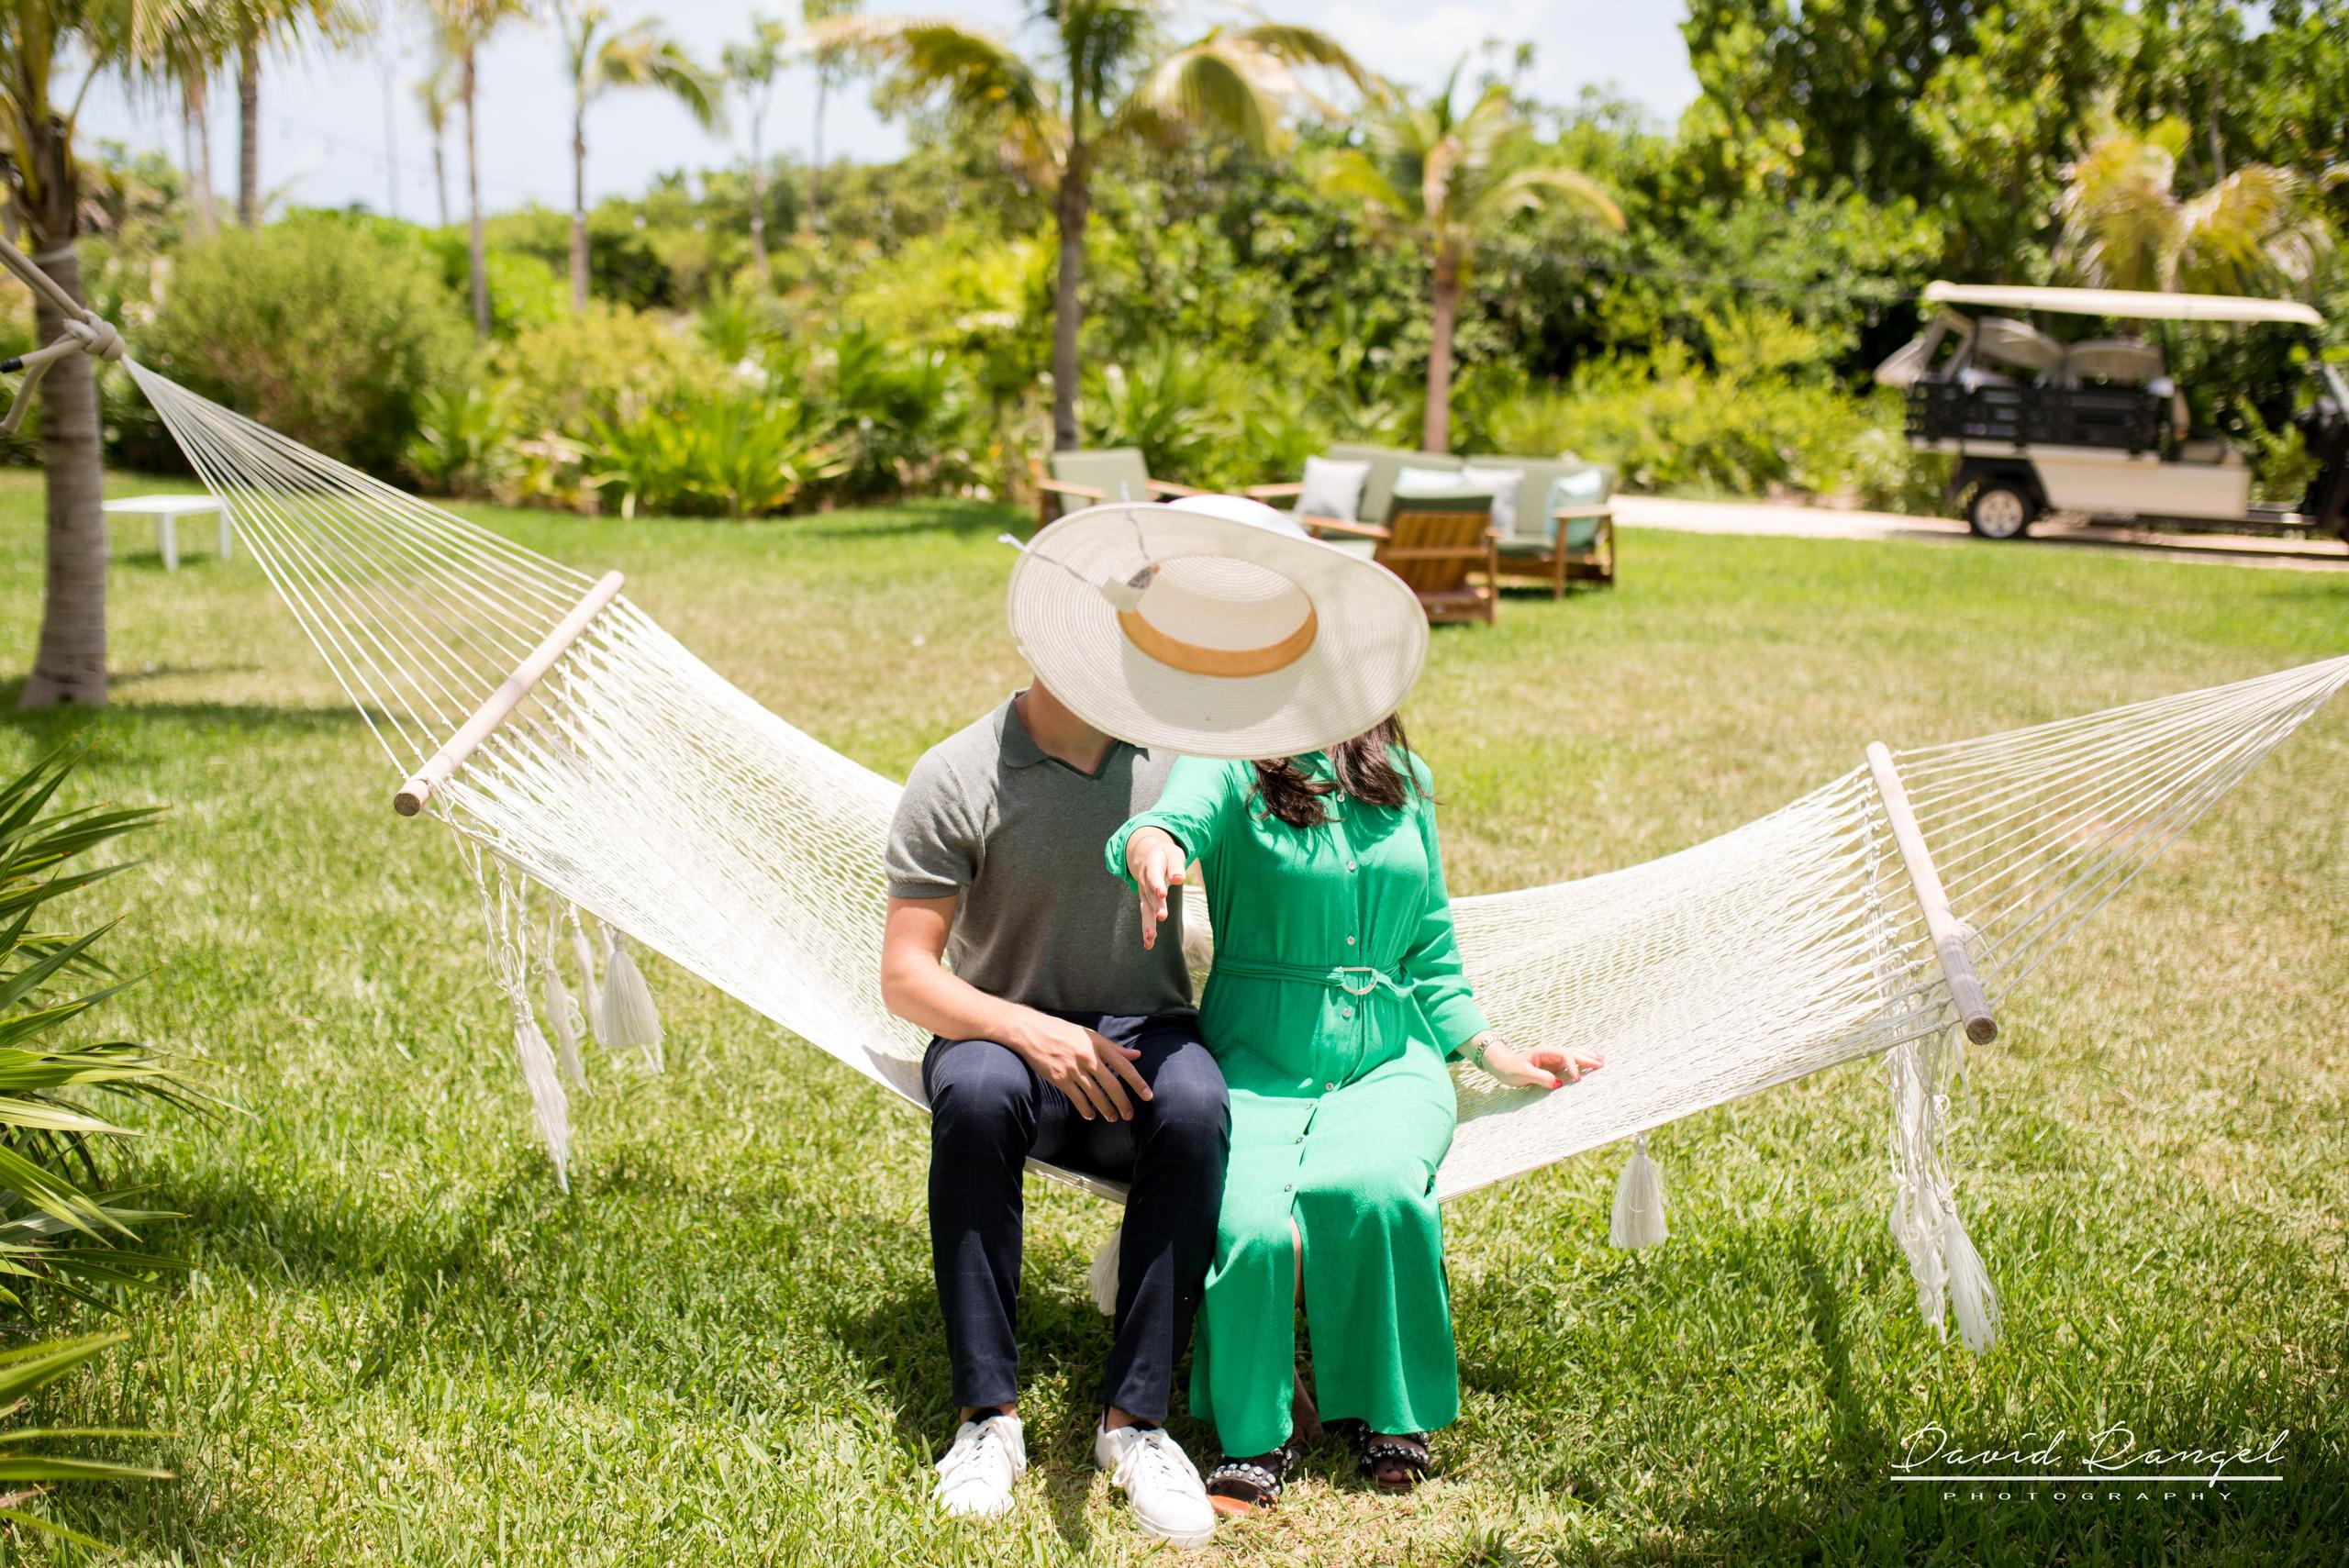 couple+hotel+atelier+happy+love+together+playa+mujeres+destination+photographer+photo+hamac+hat+garden+trees+kiss